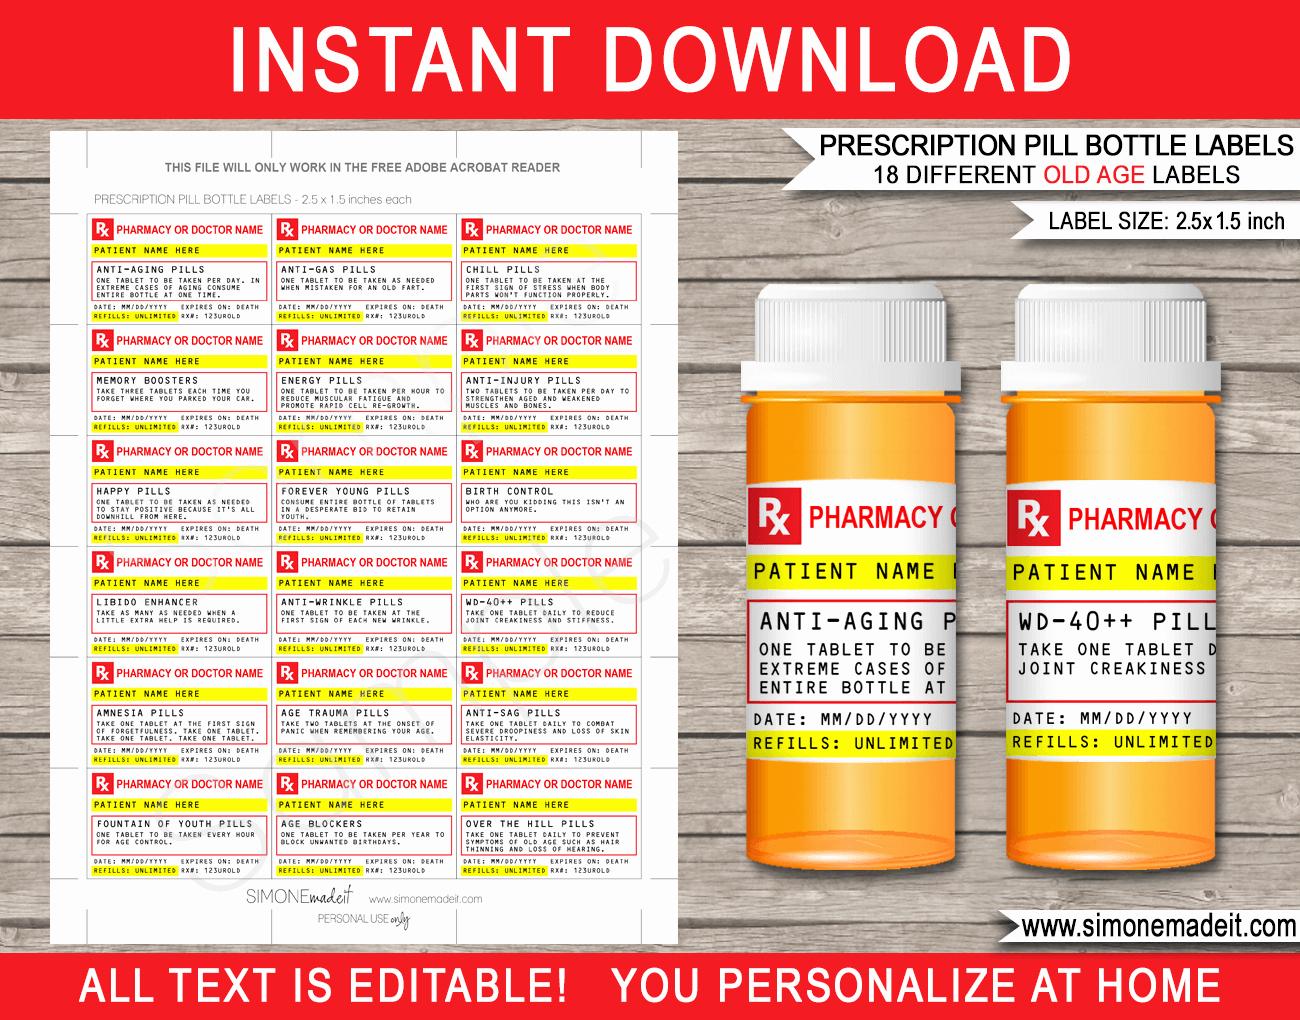 Pill Bottle Label Template Fresh Old Age Prescription Pill Bottle Labels Gag Gift